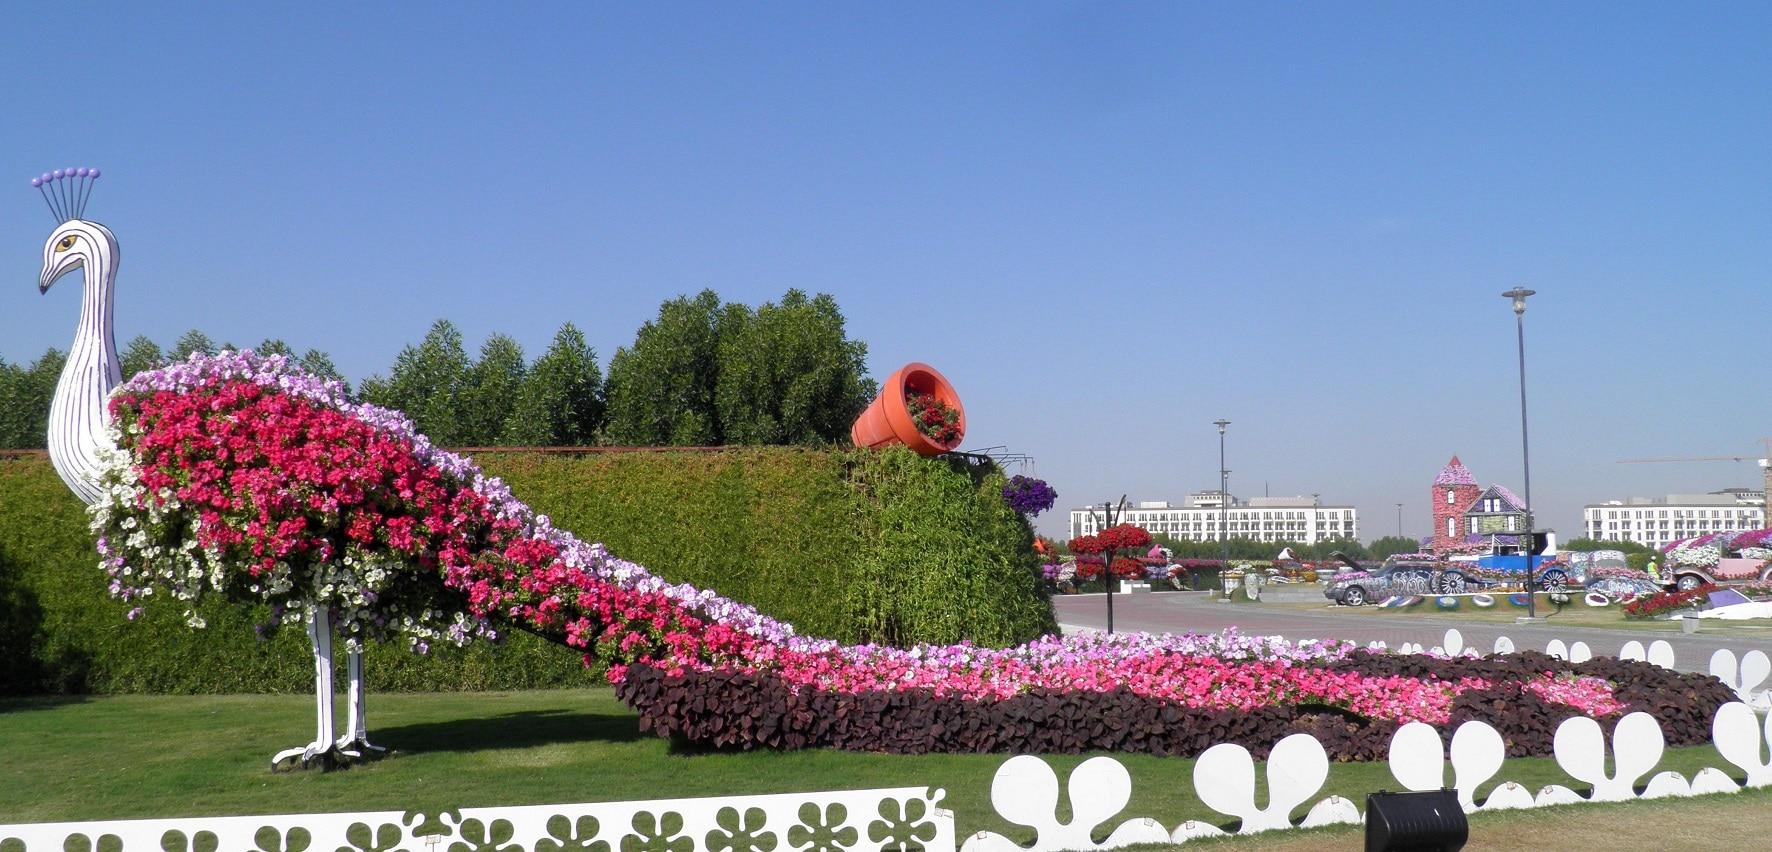 Păun din flori din Dubai Miracle Garden